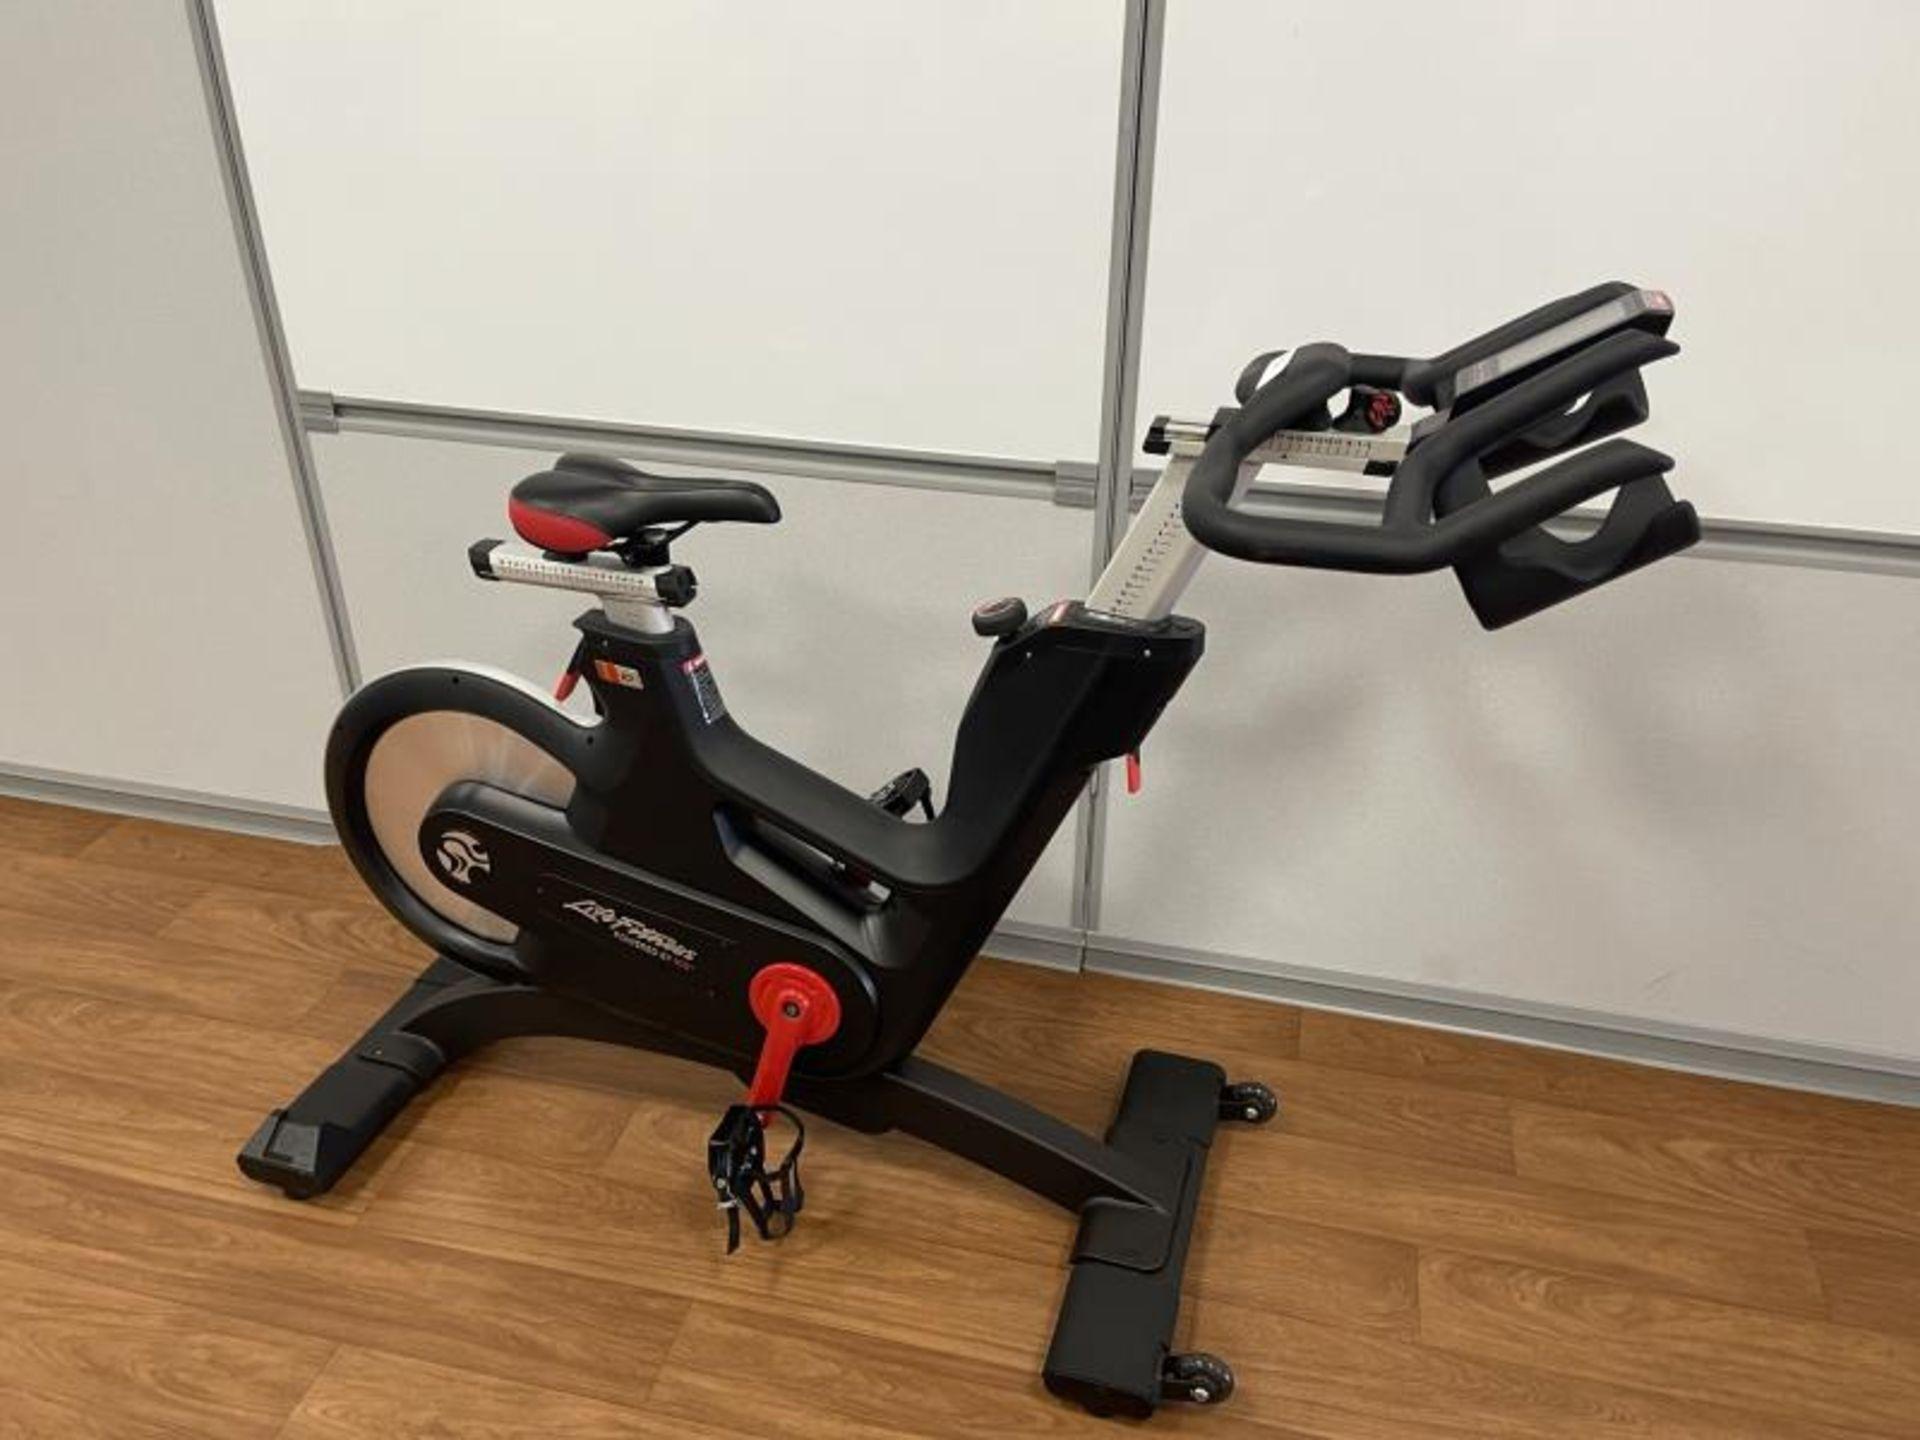 2018 Life Fitness IC7 Spin Bikes M: IC-LFIC7B2-01 - Image 2 of 3